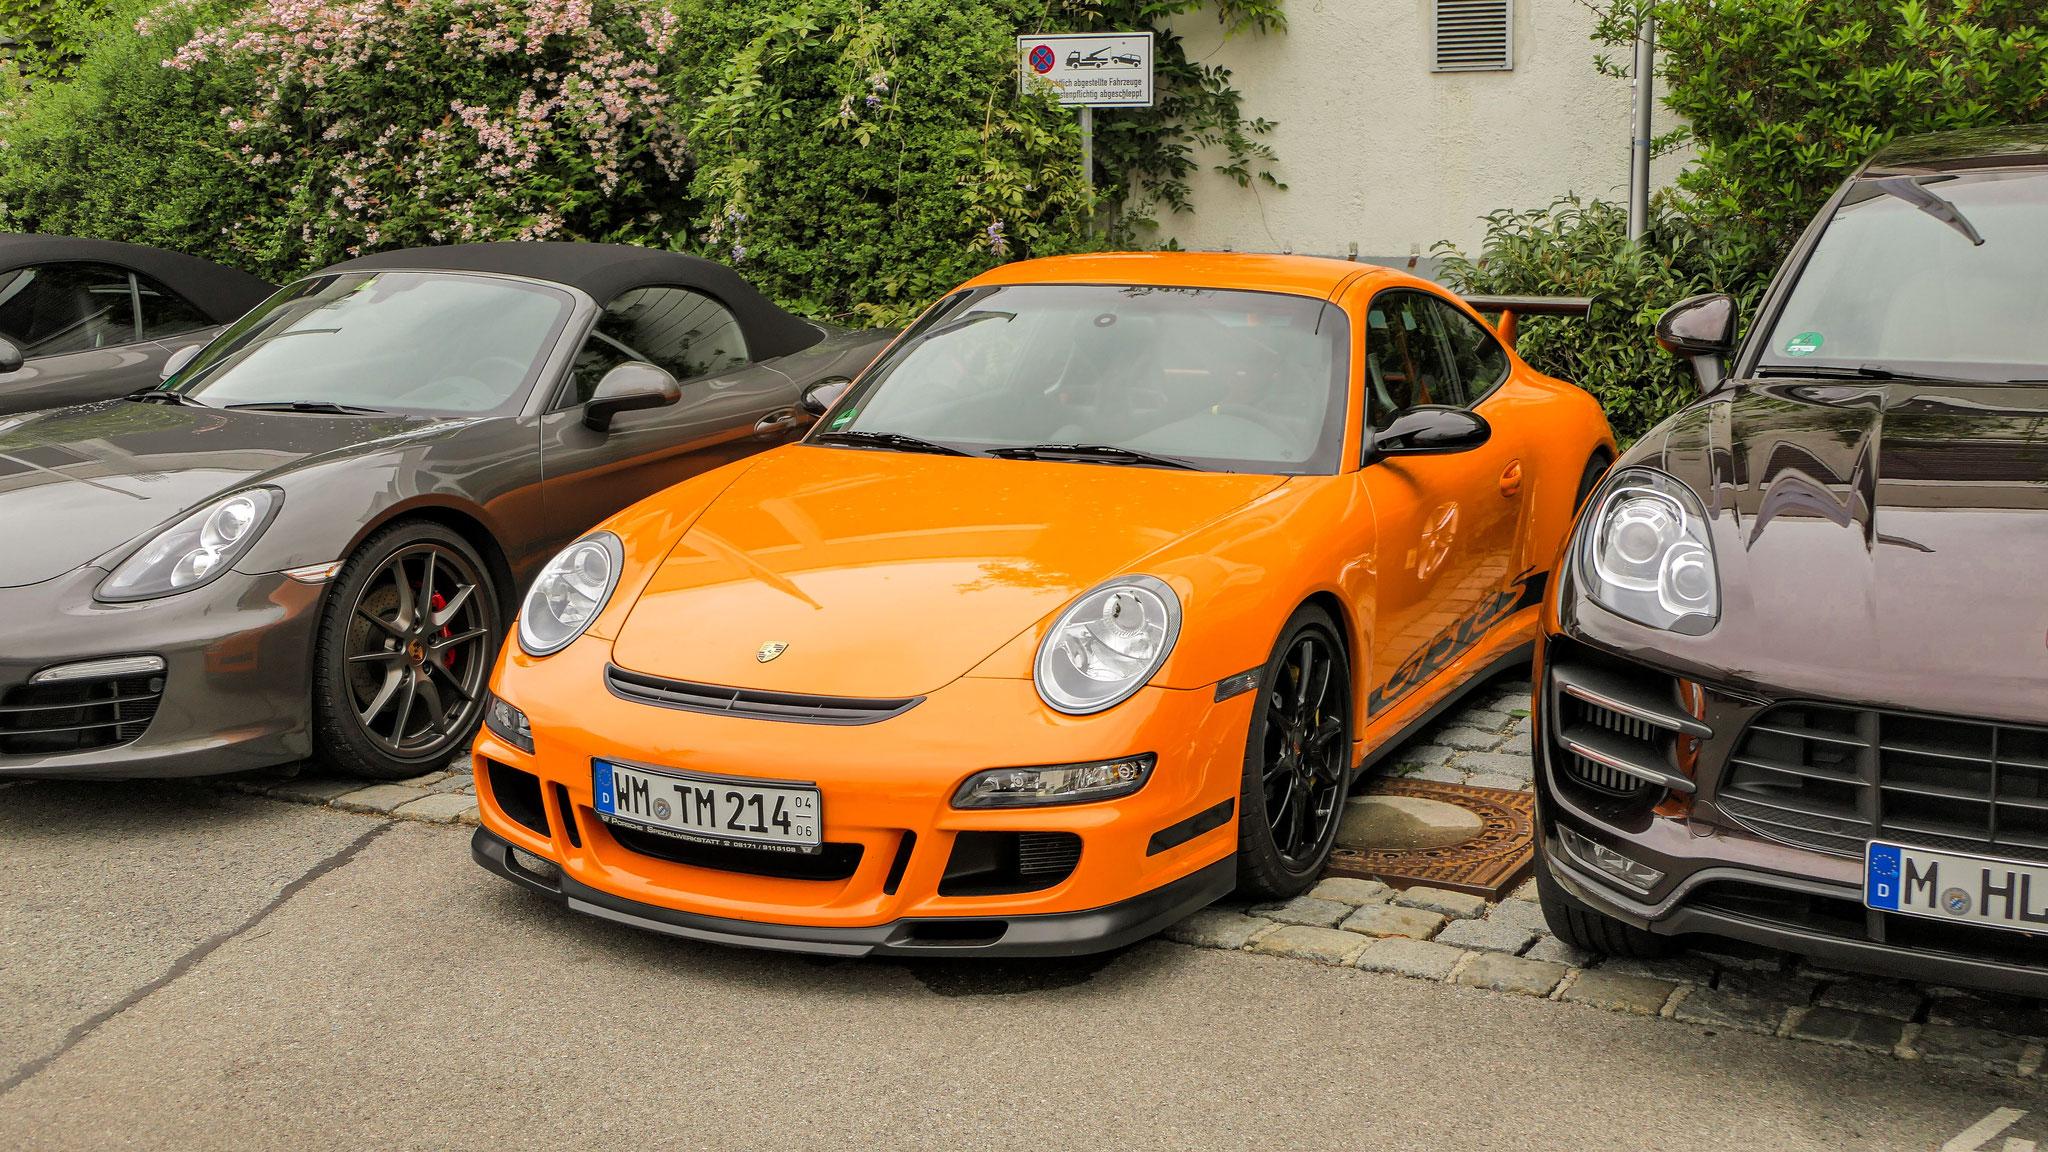 Porsche 911 GT3 RS - WM-TM-214